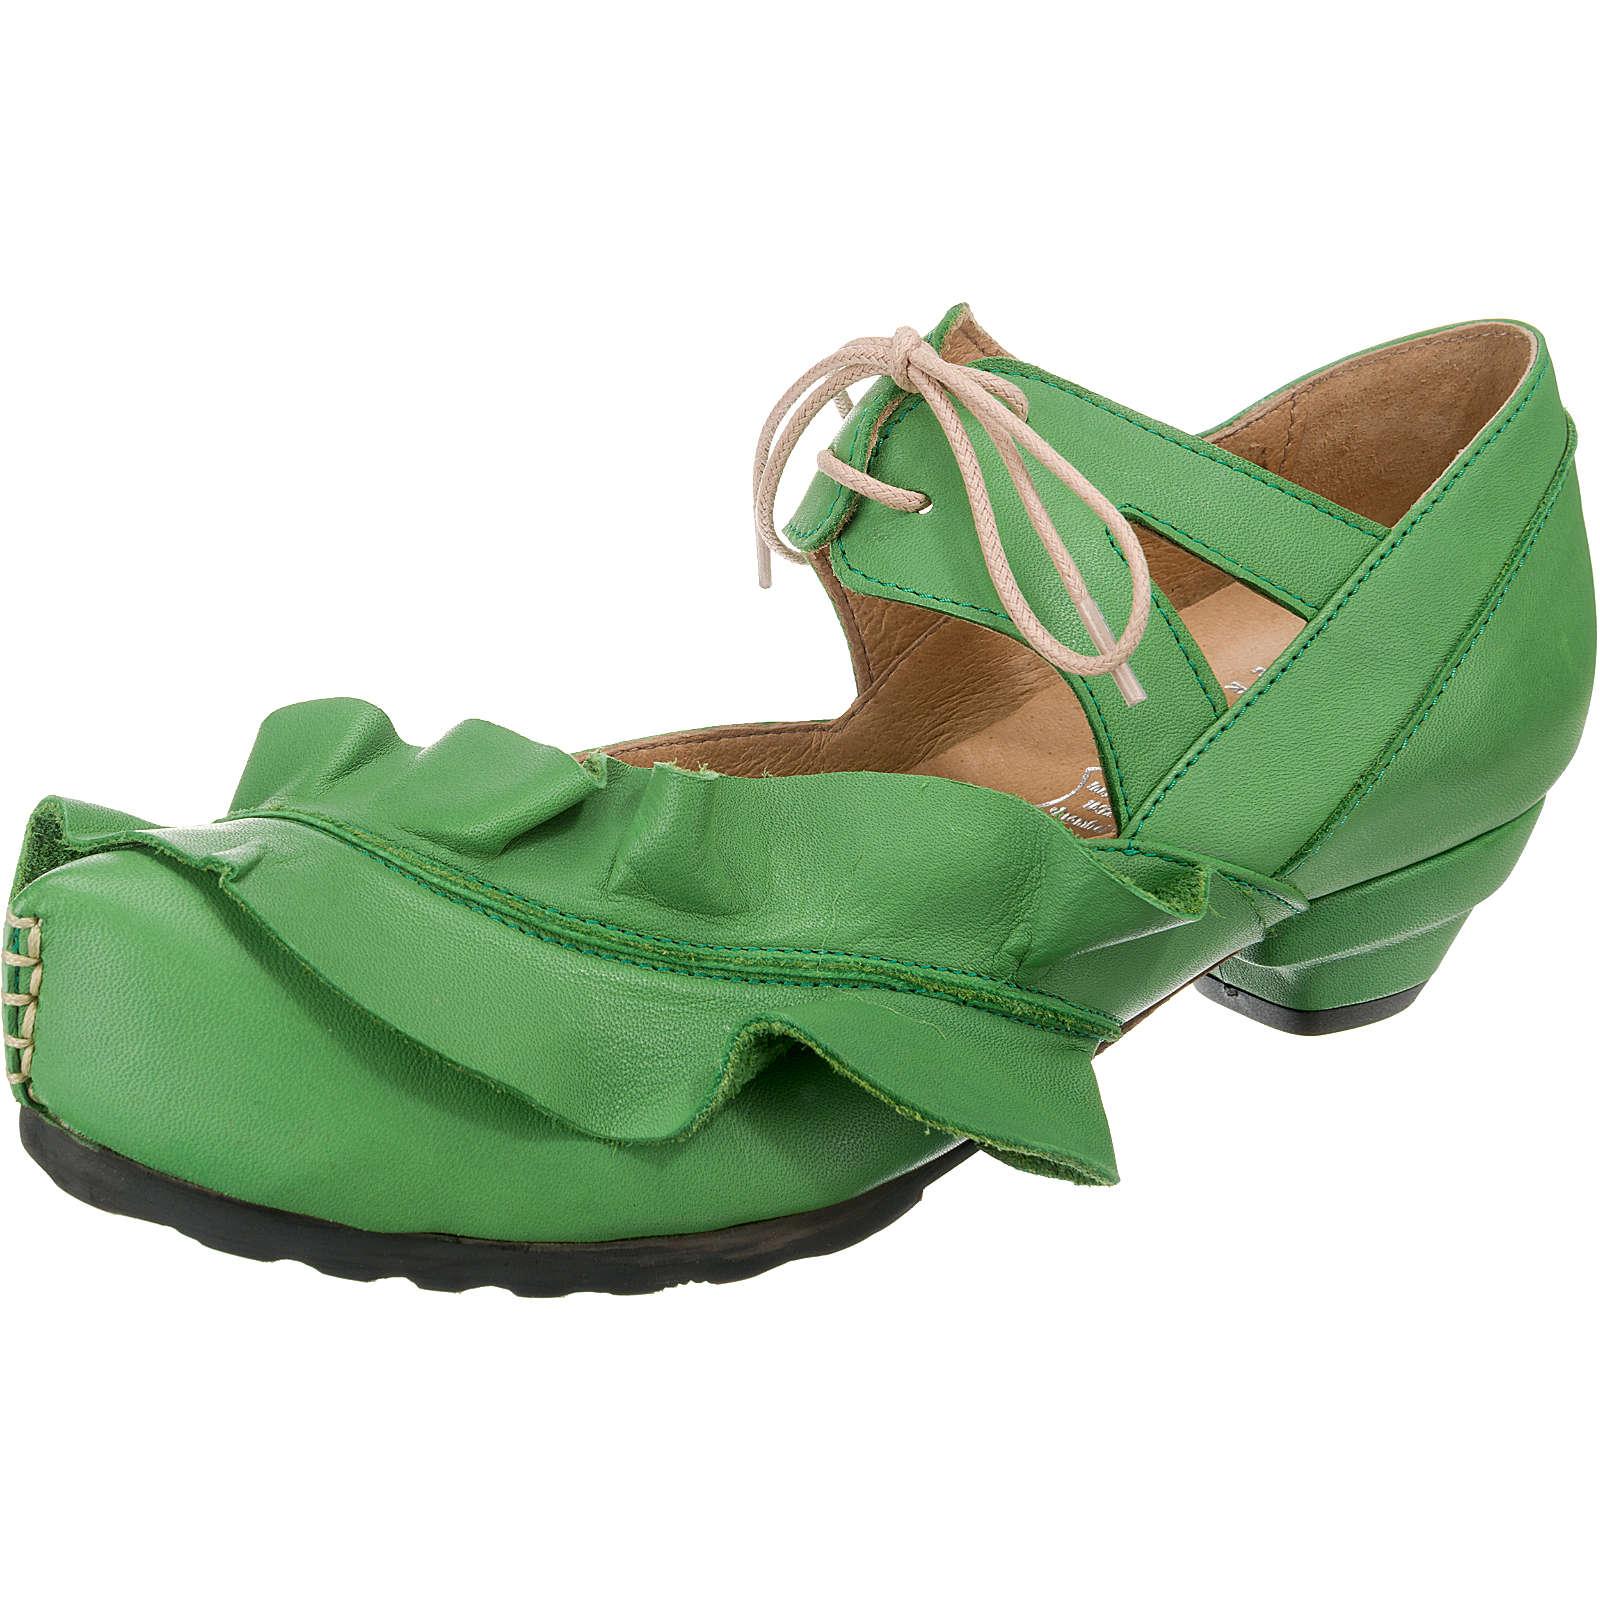 Tiggers® Lore Schnürpumps grün Damen Gr. 36